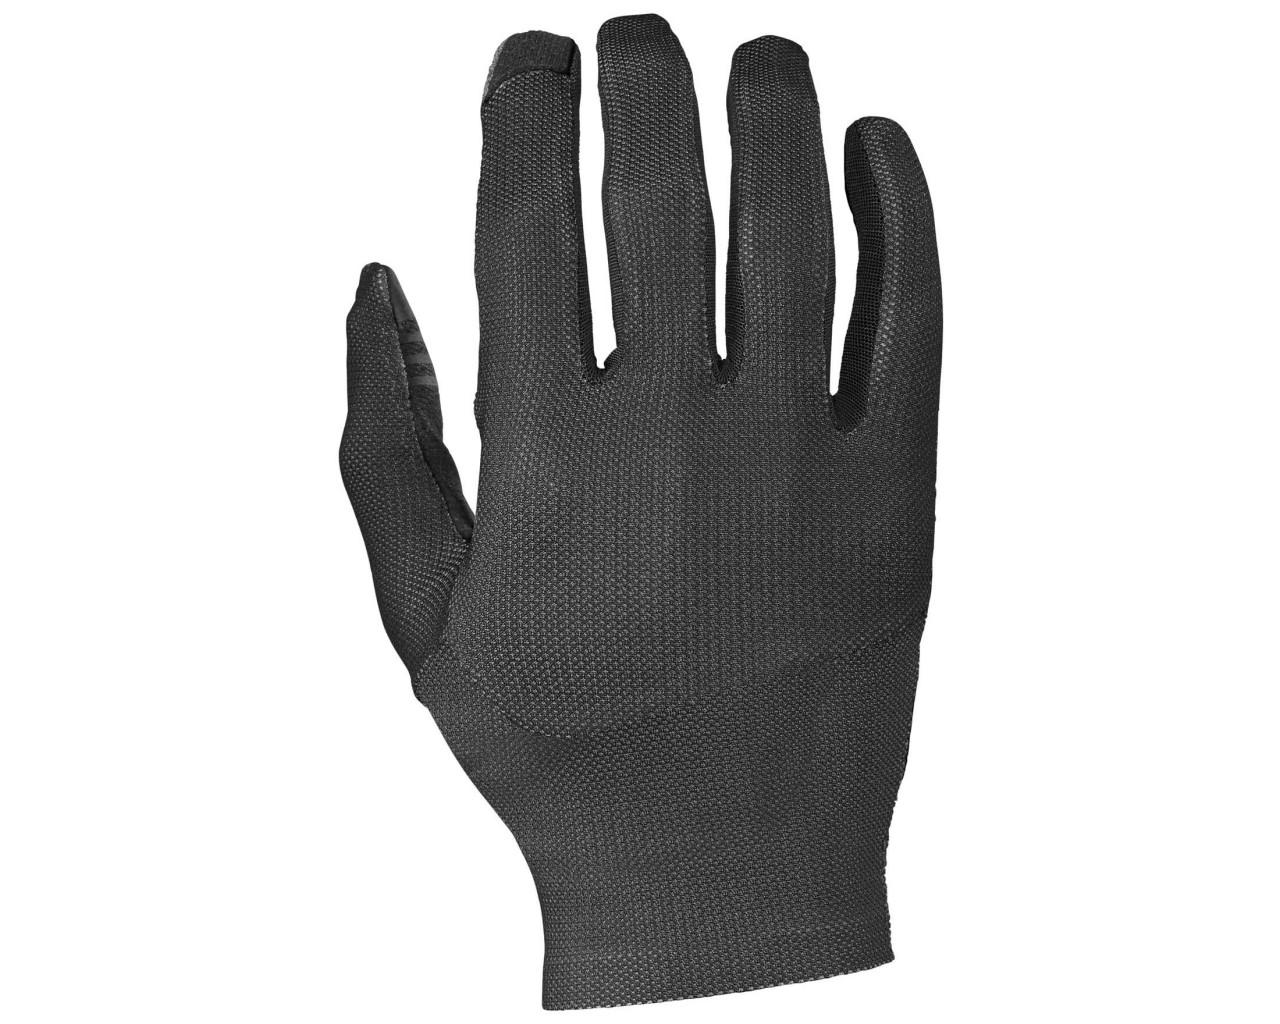 Specialized Renegade Handschuhe langfinger | black